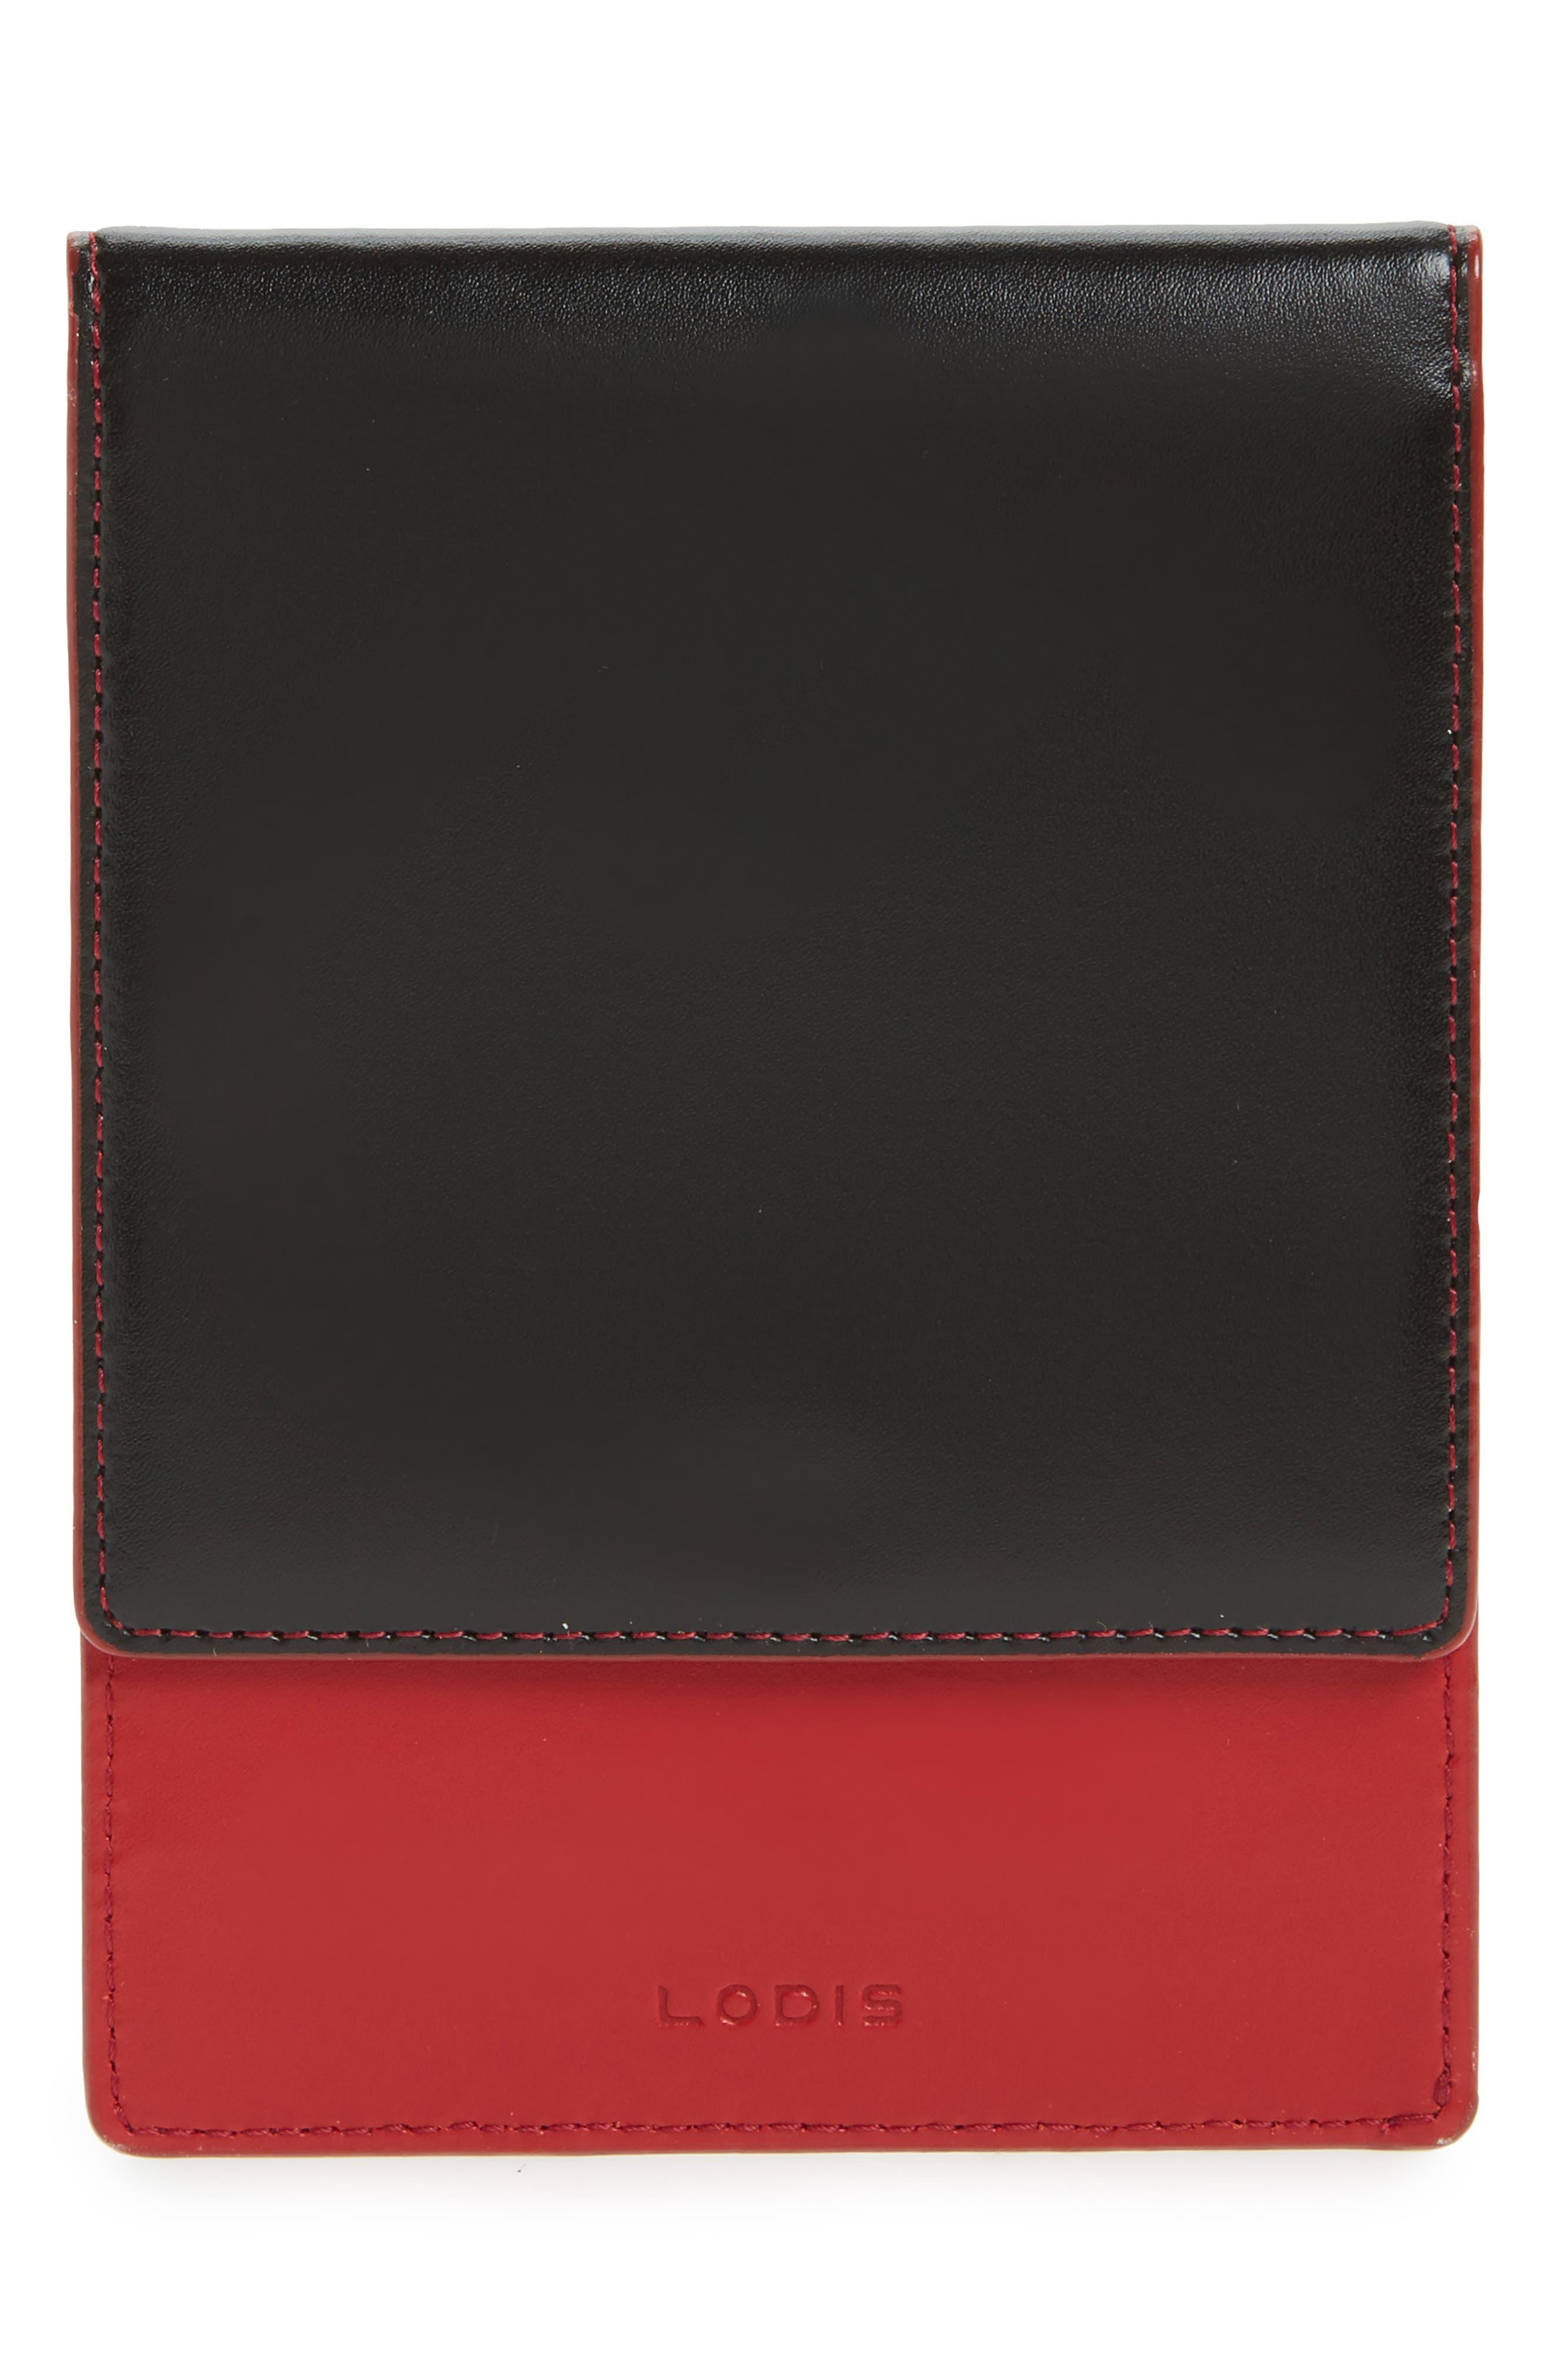 Alternate Image 1 Selected - LODIS Audrey Under Lock & Key Skyler Leather Passport Wallet